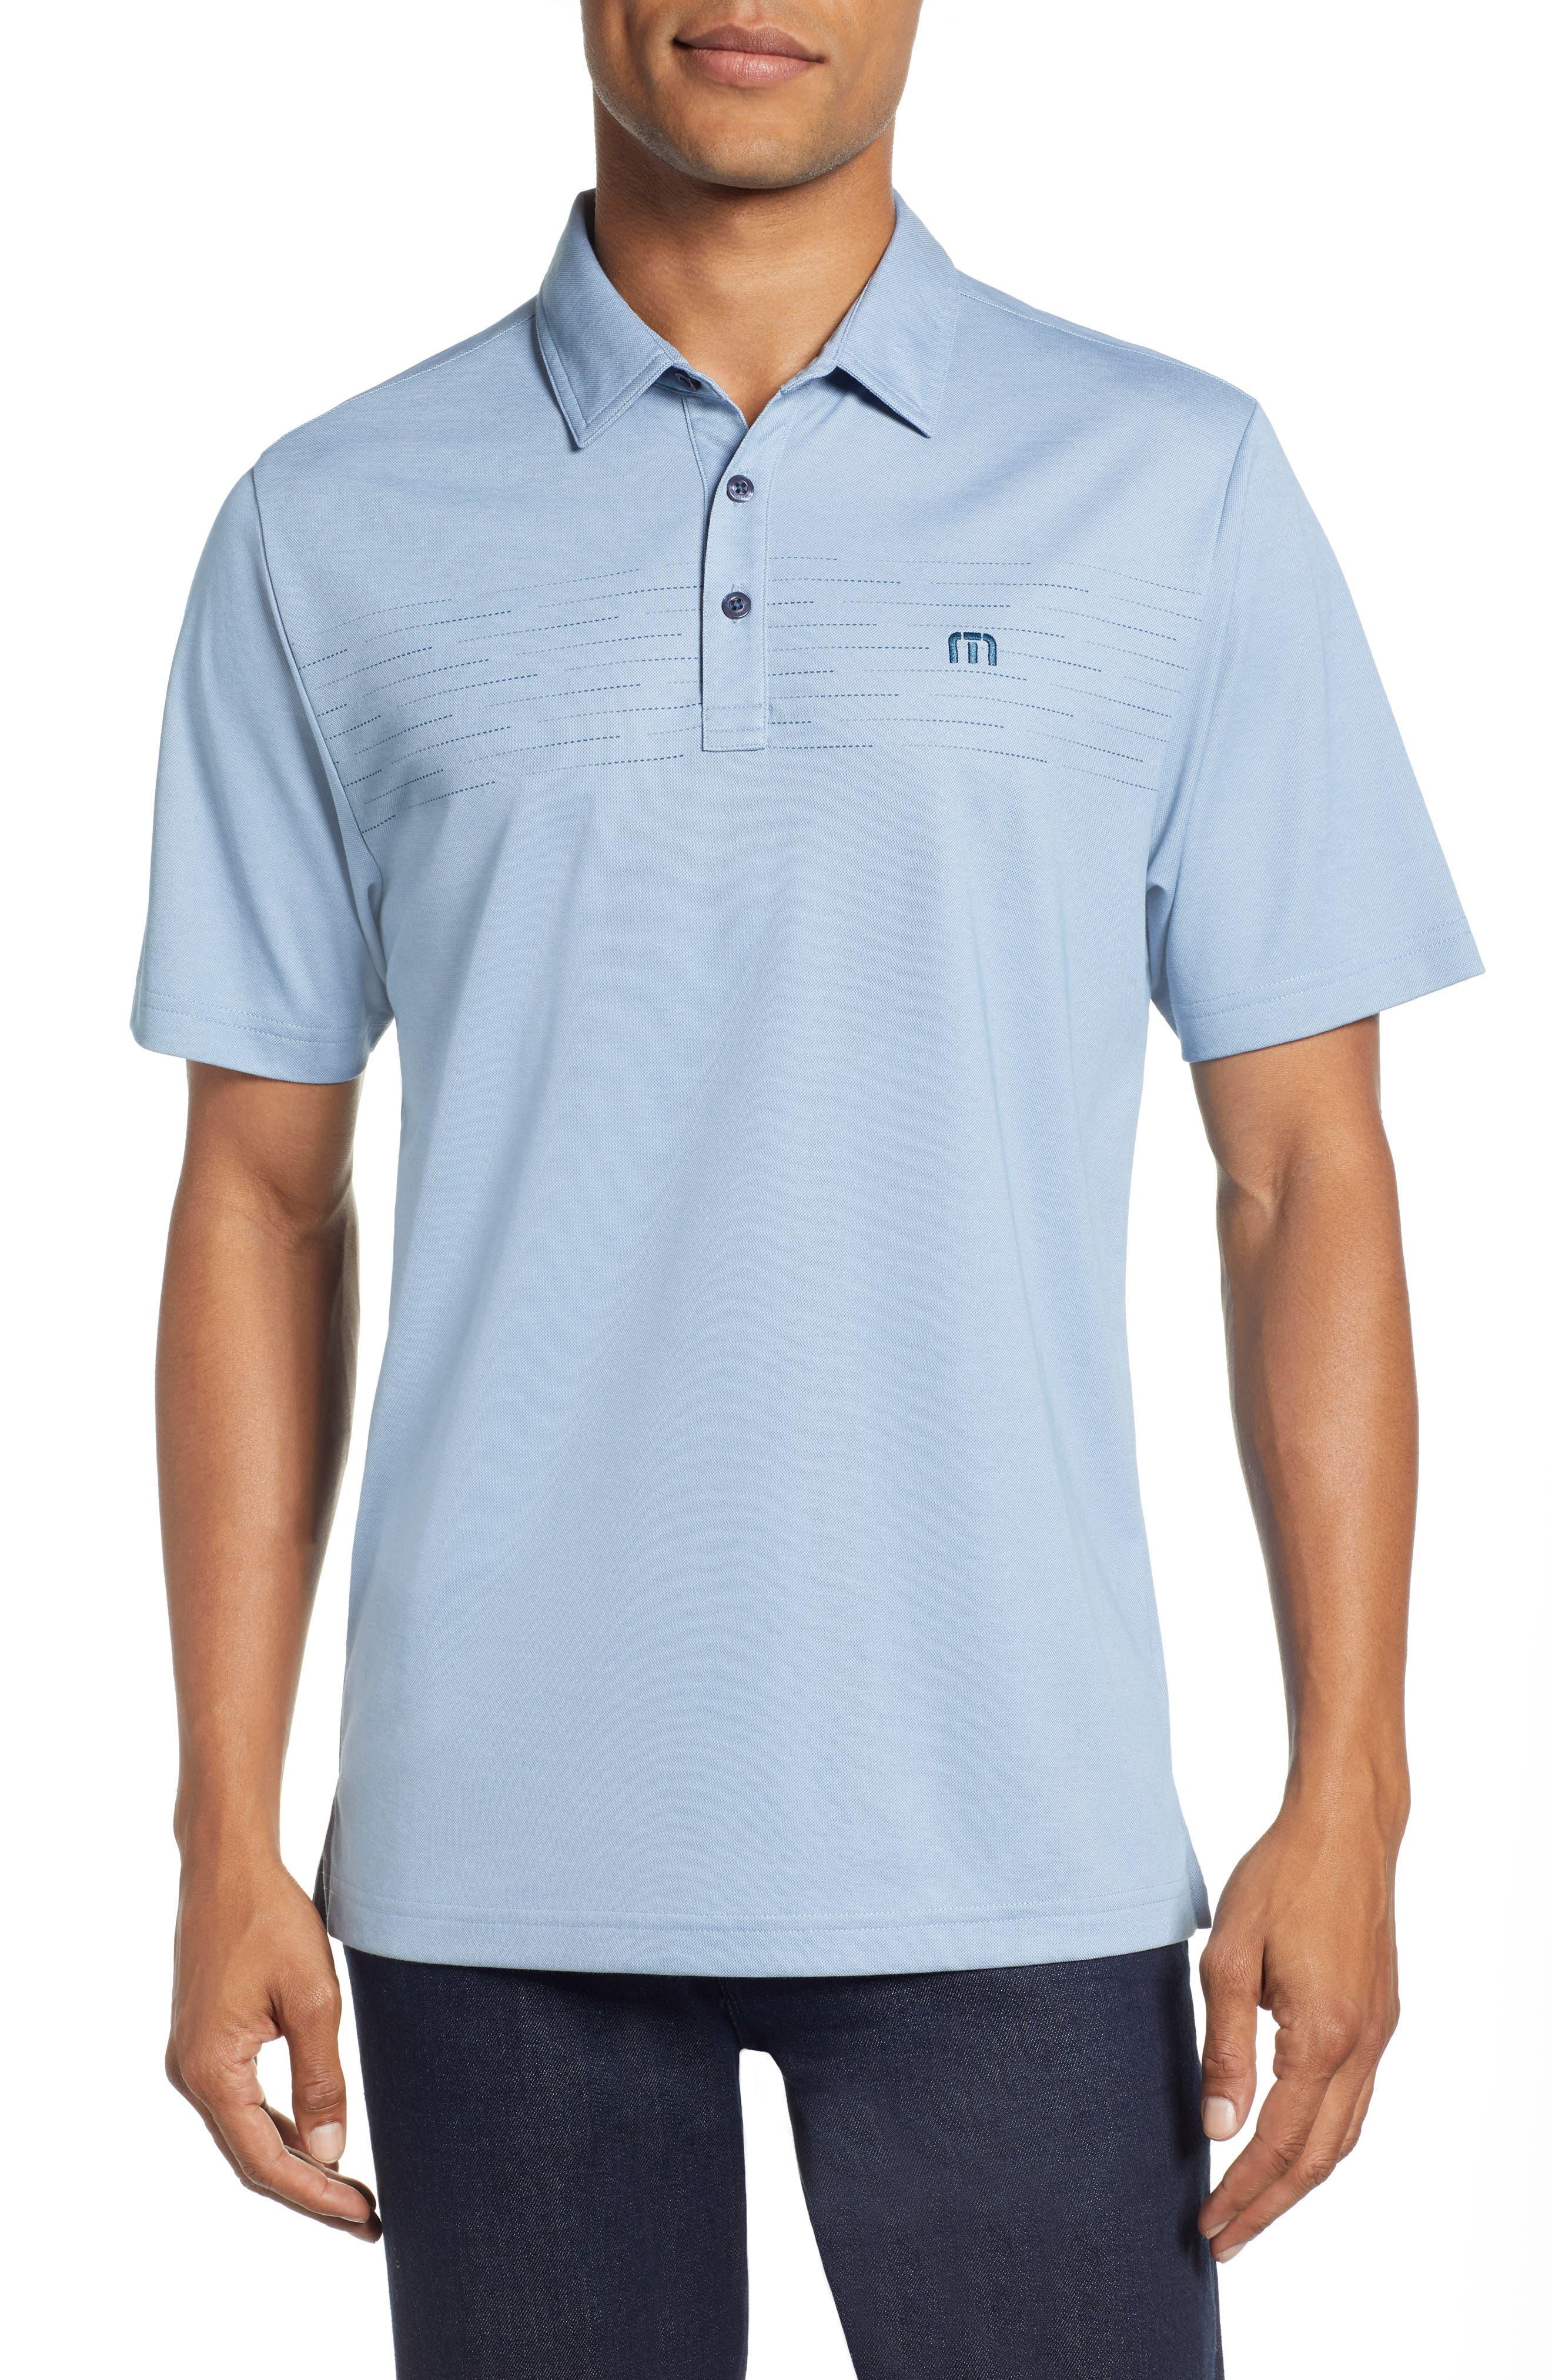 Instatweet Regular Fit Polo,                         Main,                         color, HEATHER BLUESTONE